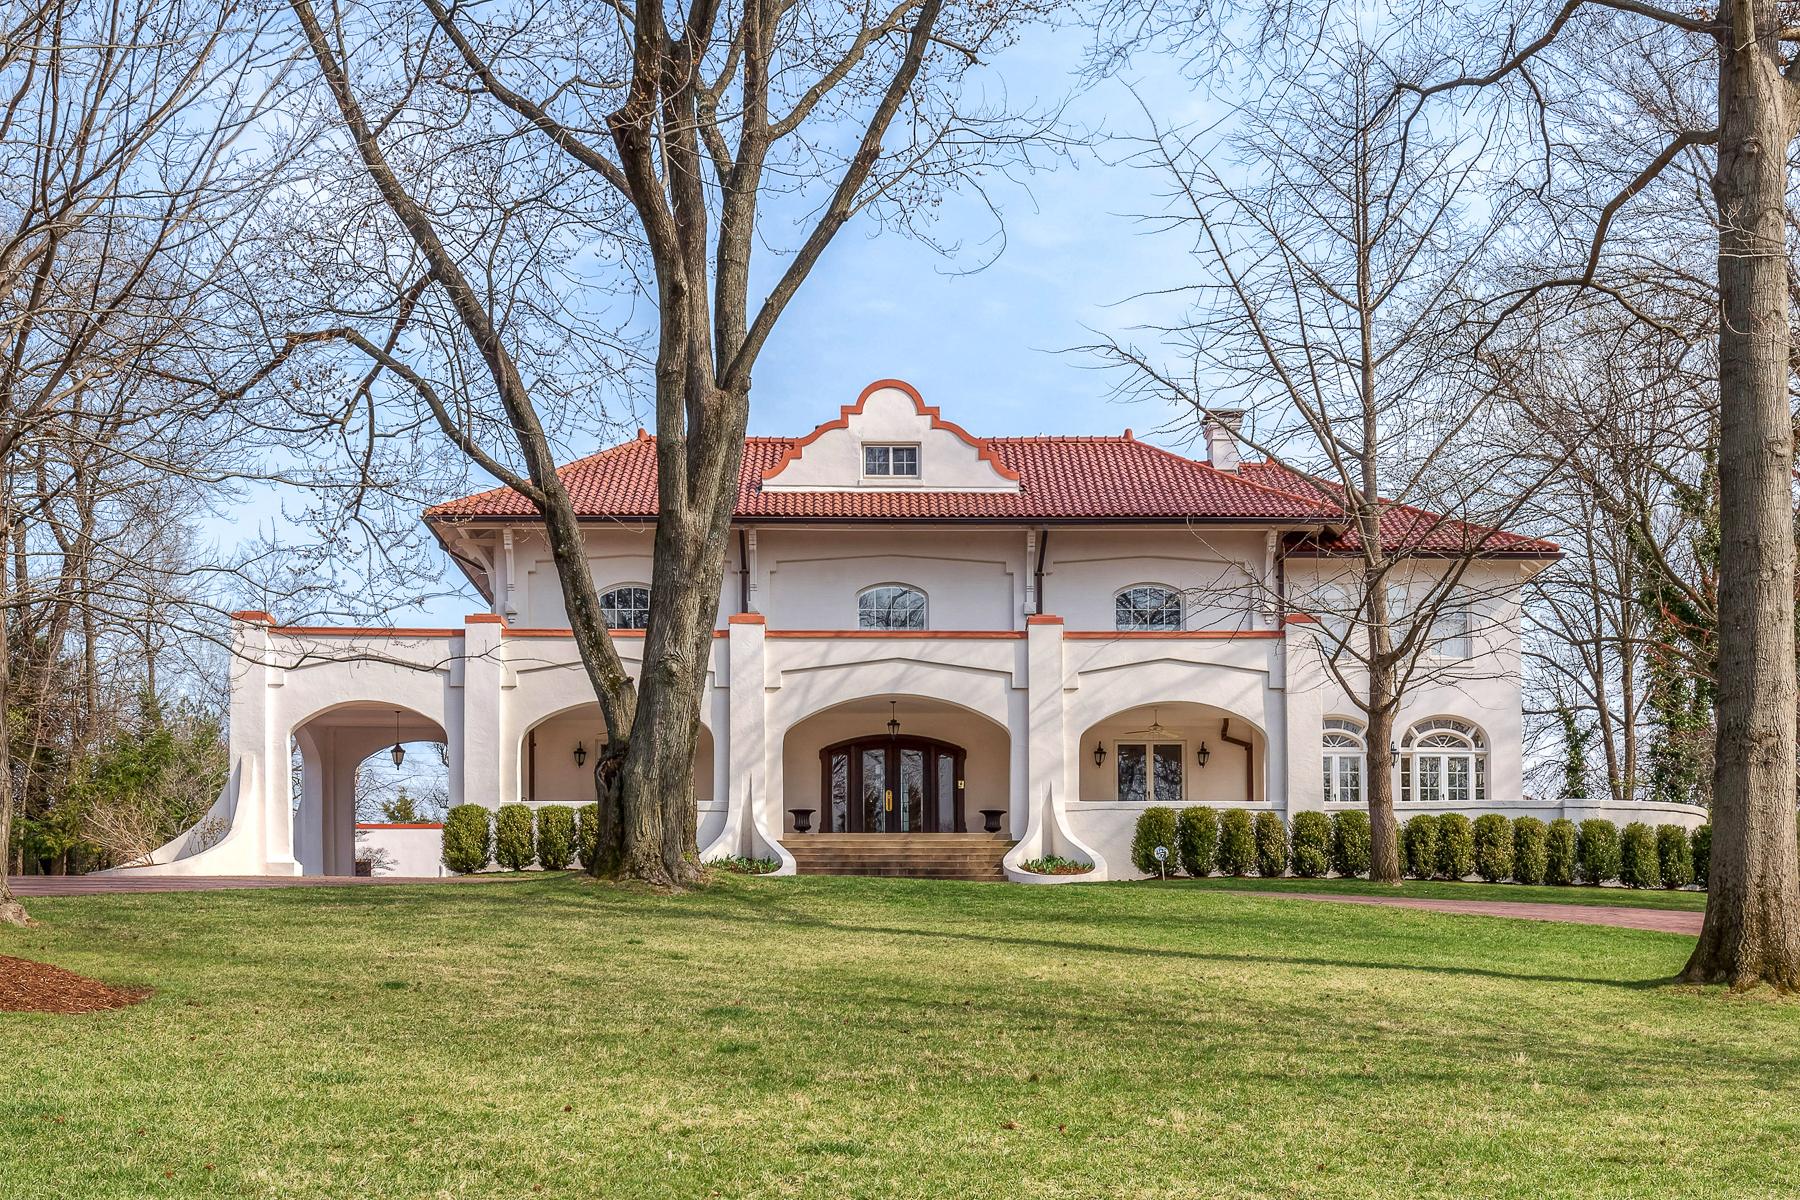 Single Family Home for Sale at Hillside Drive 1108 Hillside Drive St. Louis, Missouri 63117 United States